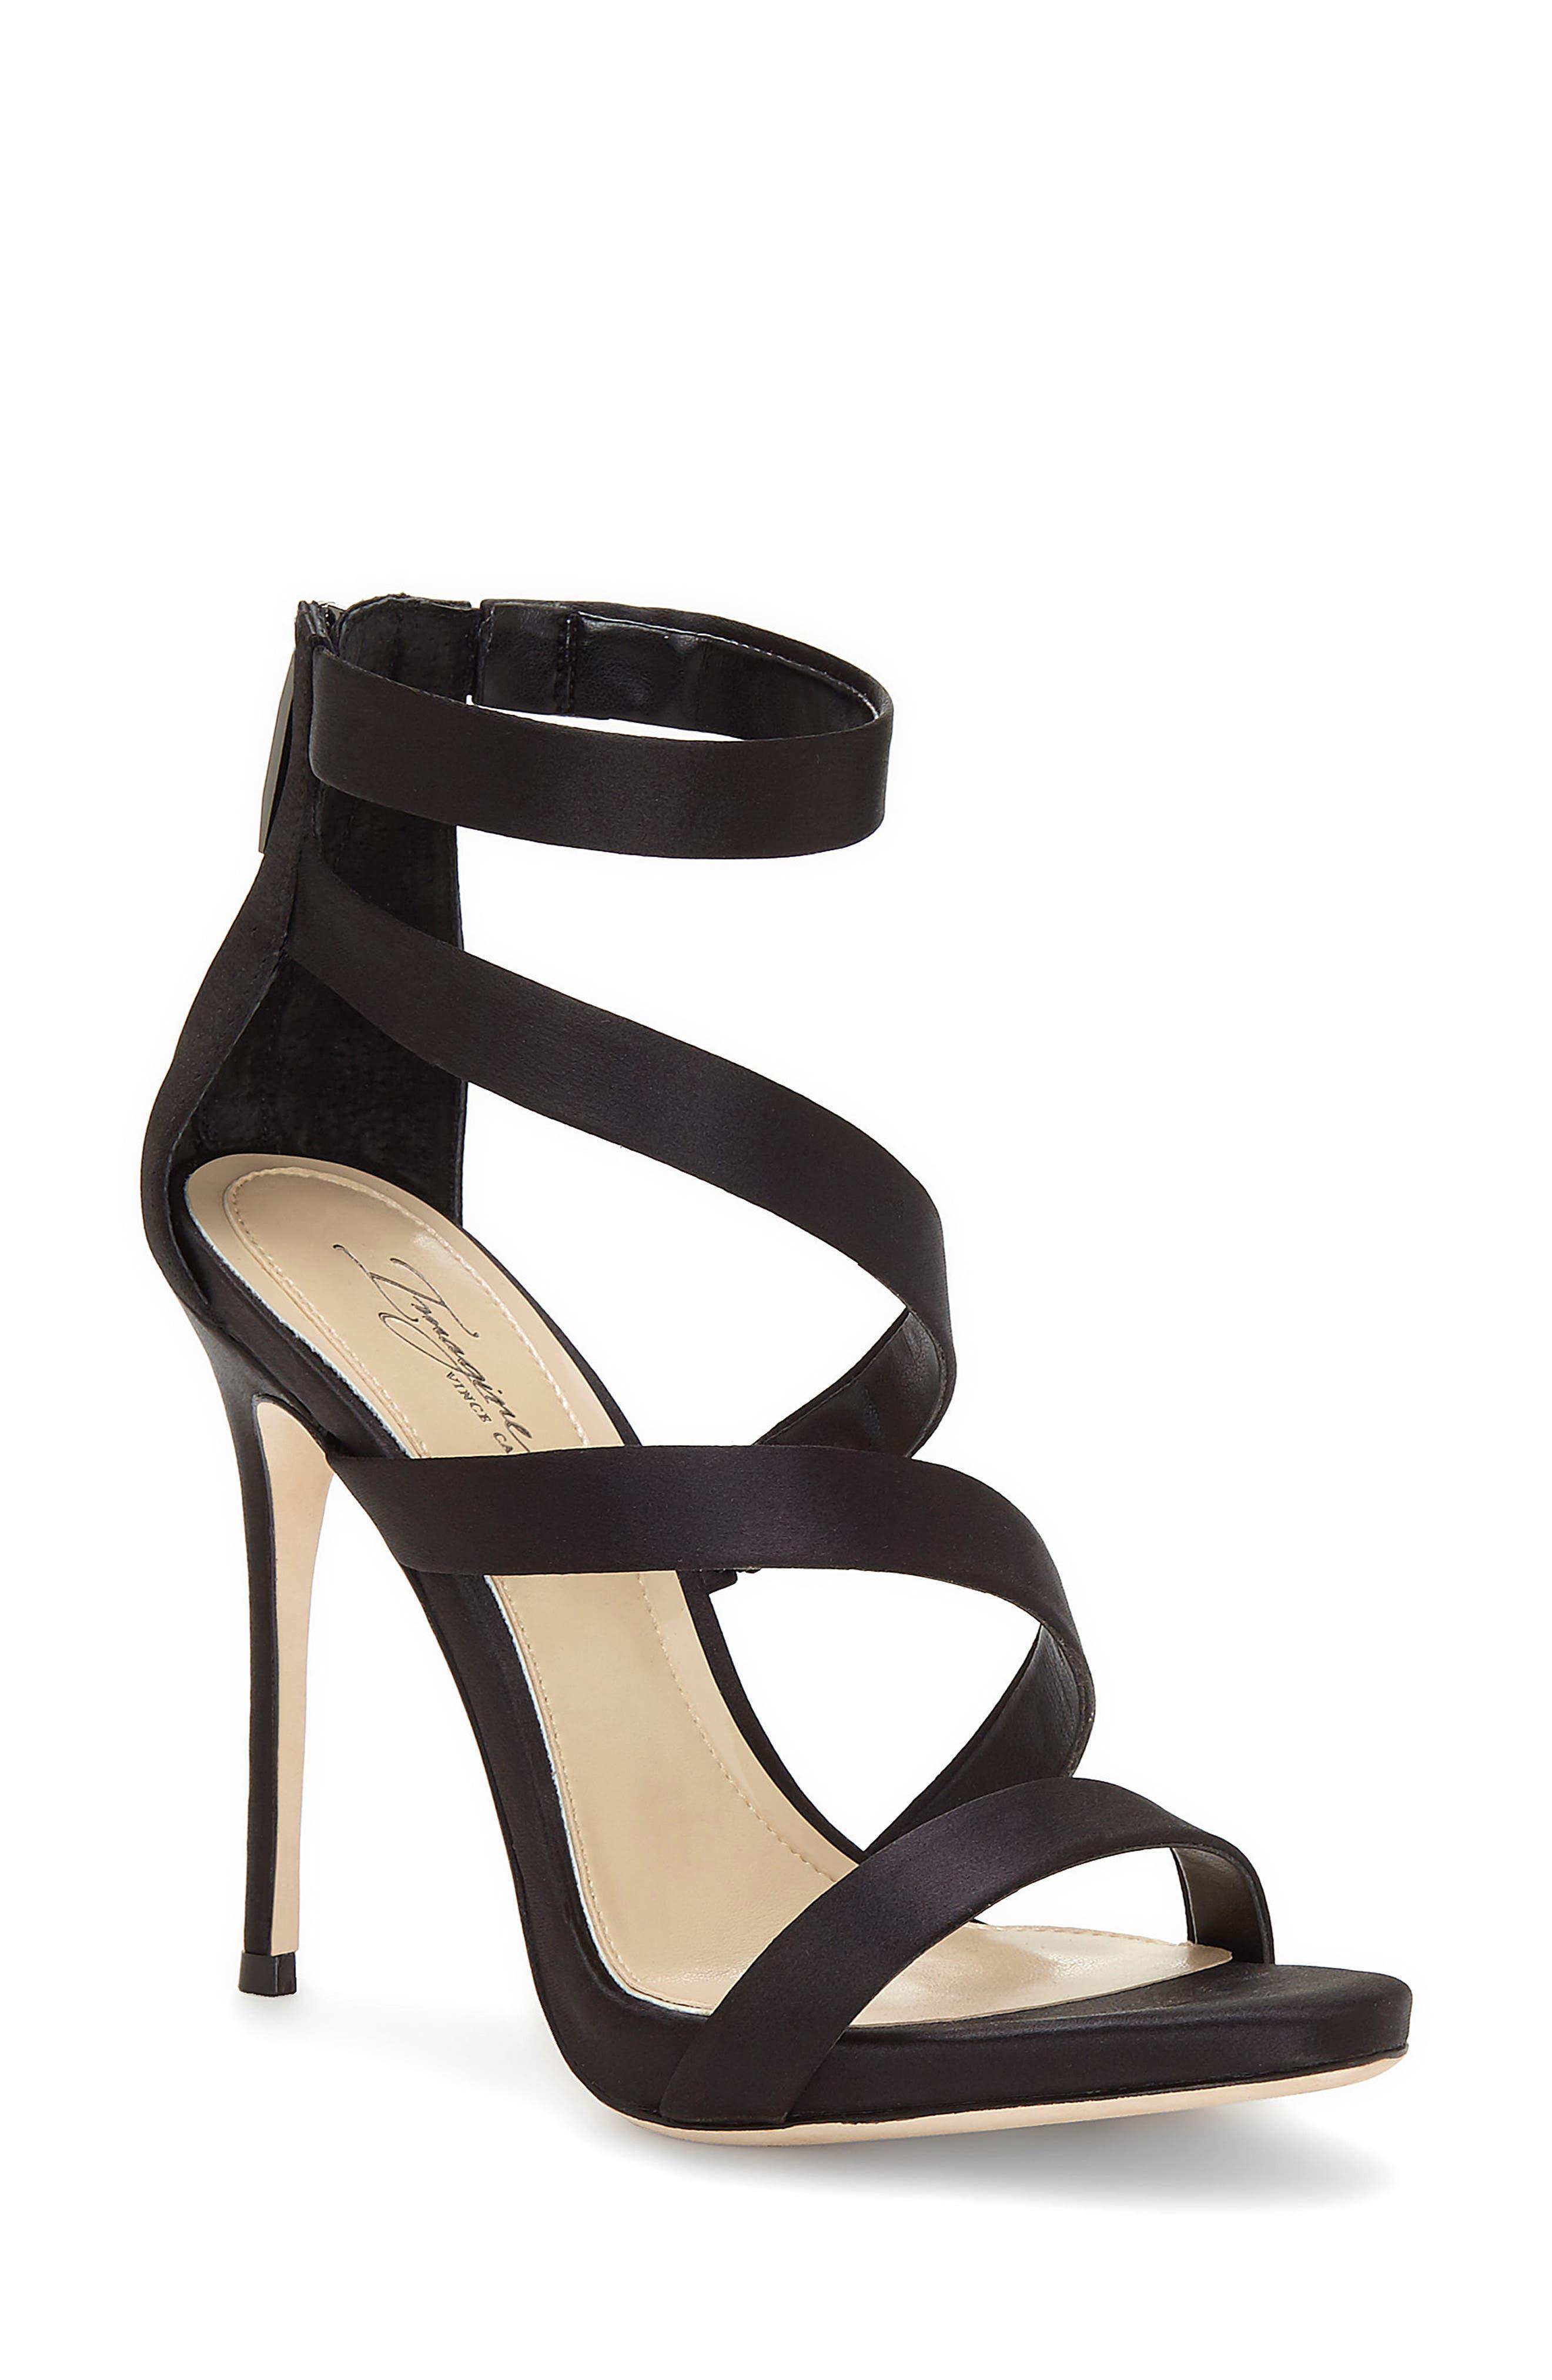 Imagine Vince Camuto Dalles Tall Strappy Sandal,                         Main,                         color, BLACK SATIN